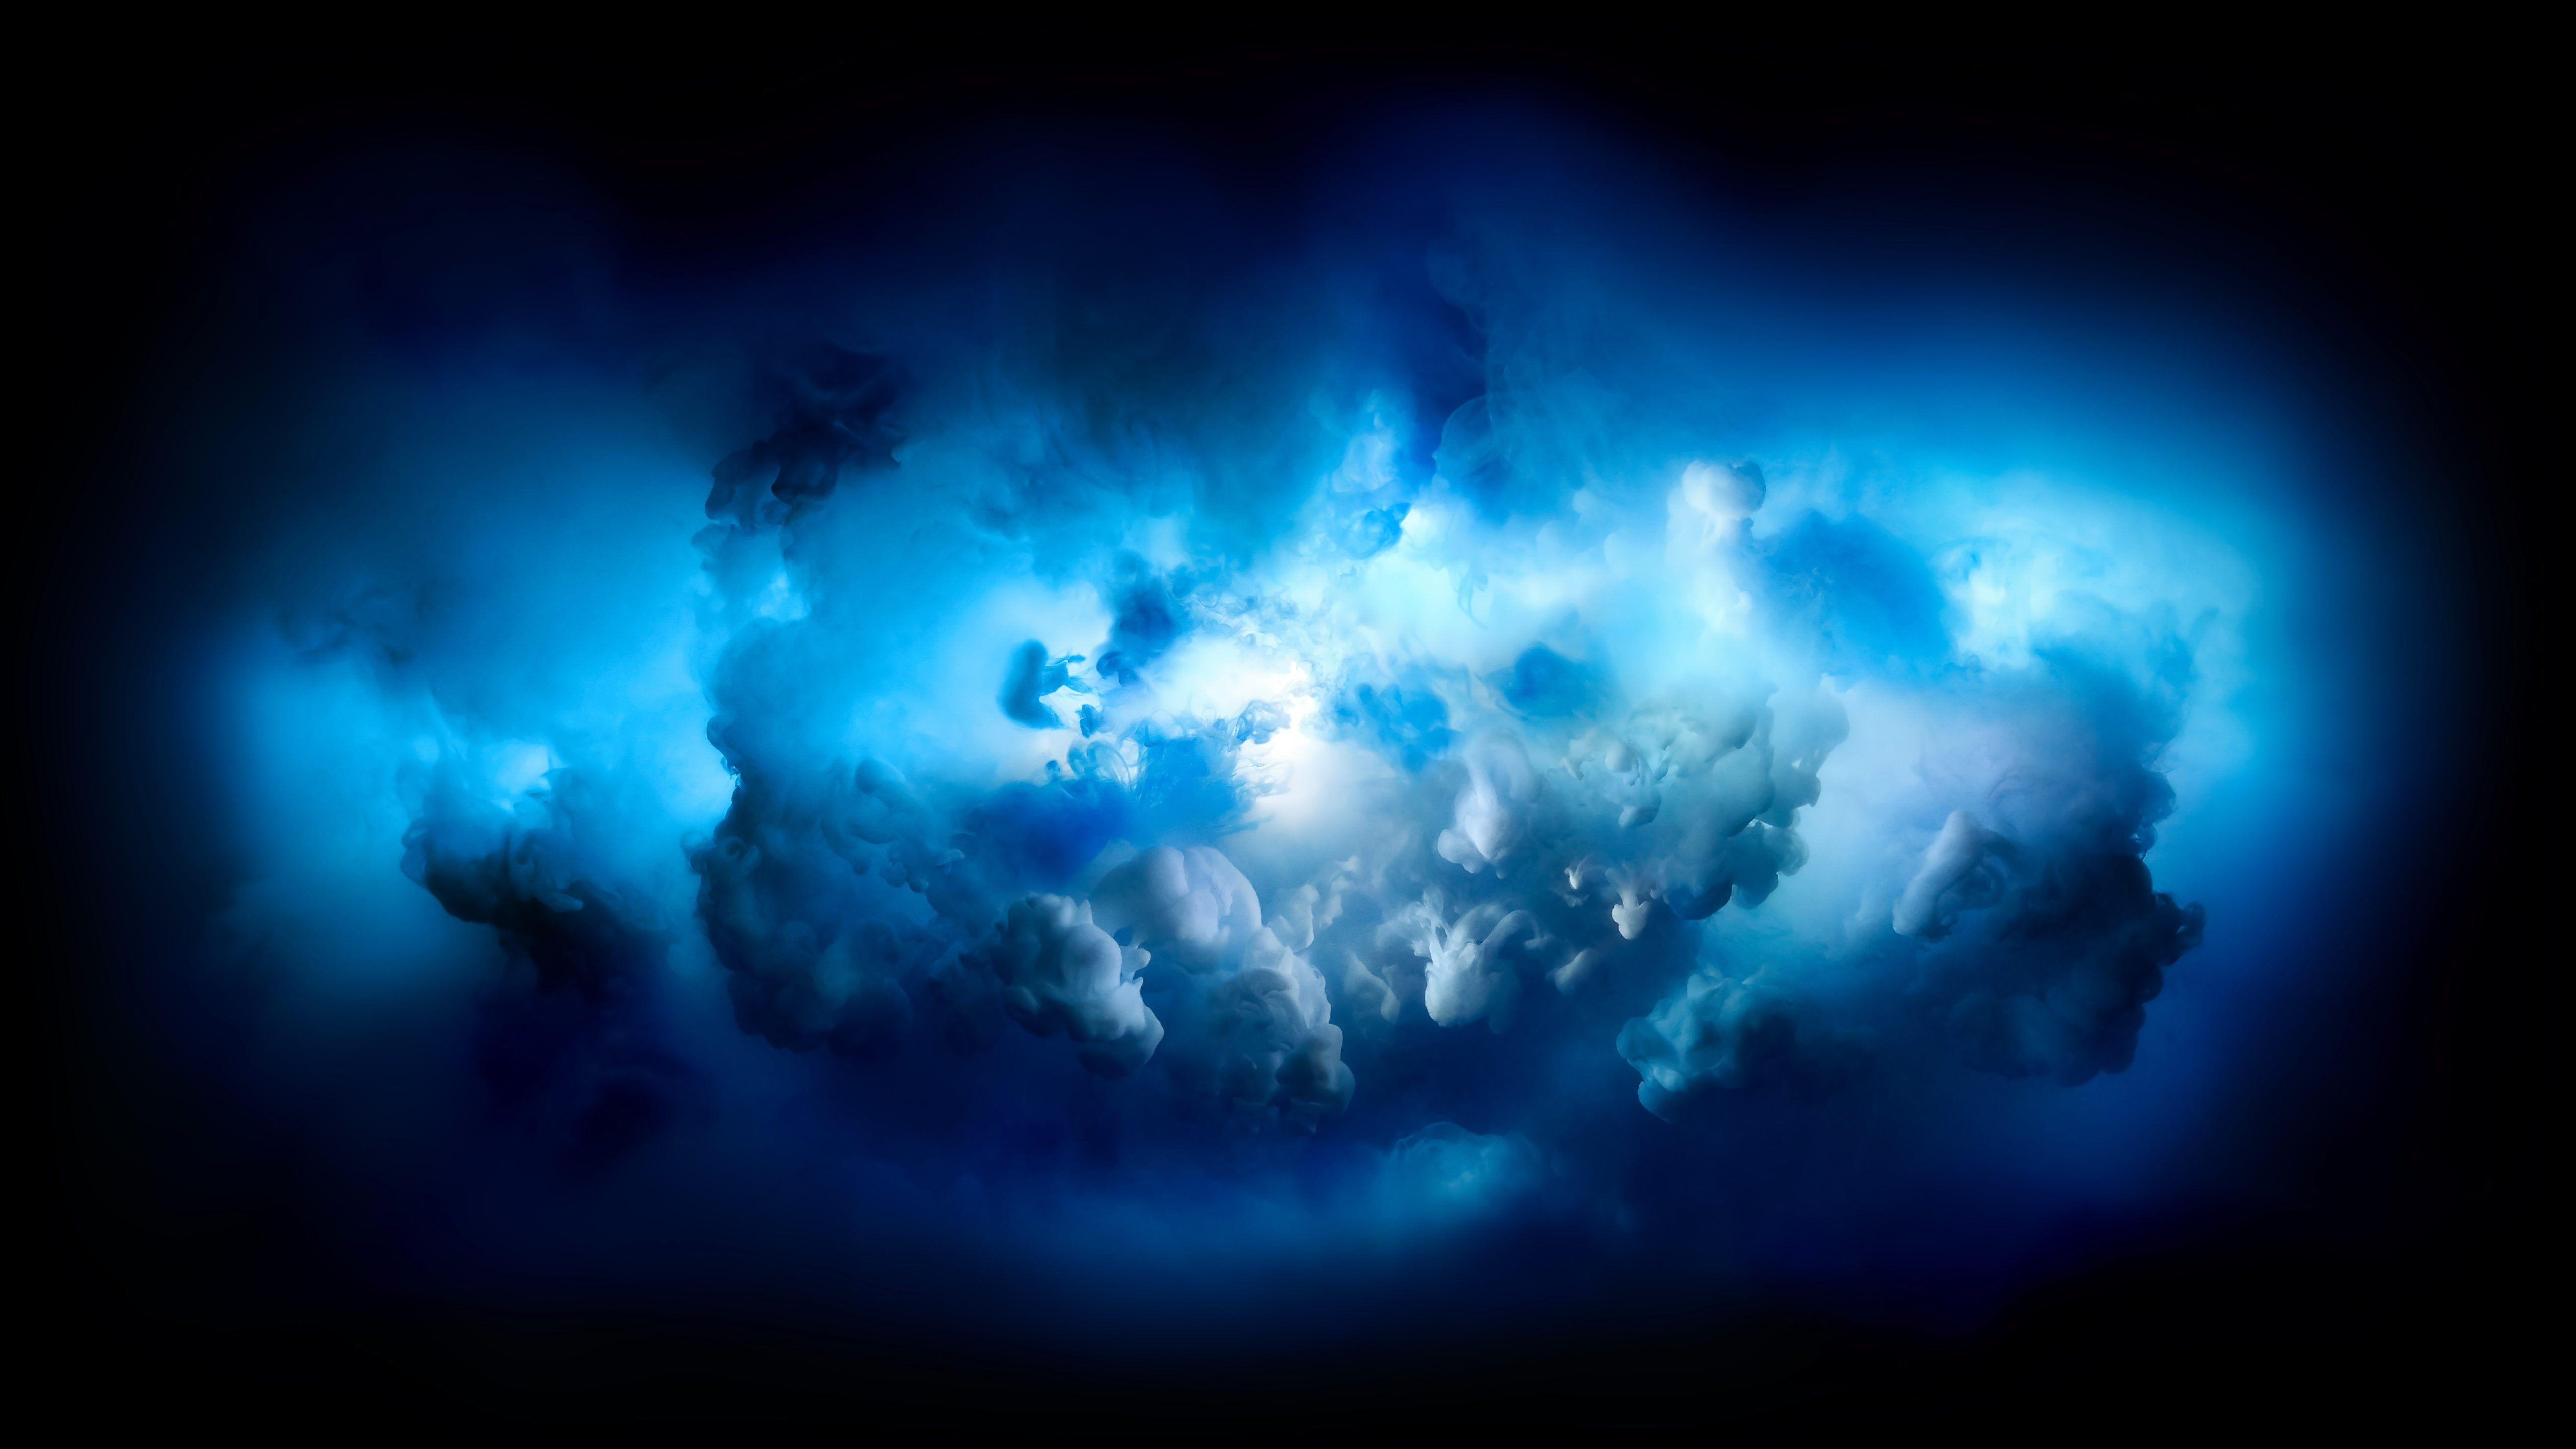 Imac Pro 専用 壁紙 青い 雲 無料 ダウンロード 高画質 Pc 待受 アップルの壁紙 雲の壁紙 大自然の写真